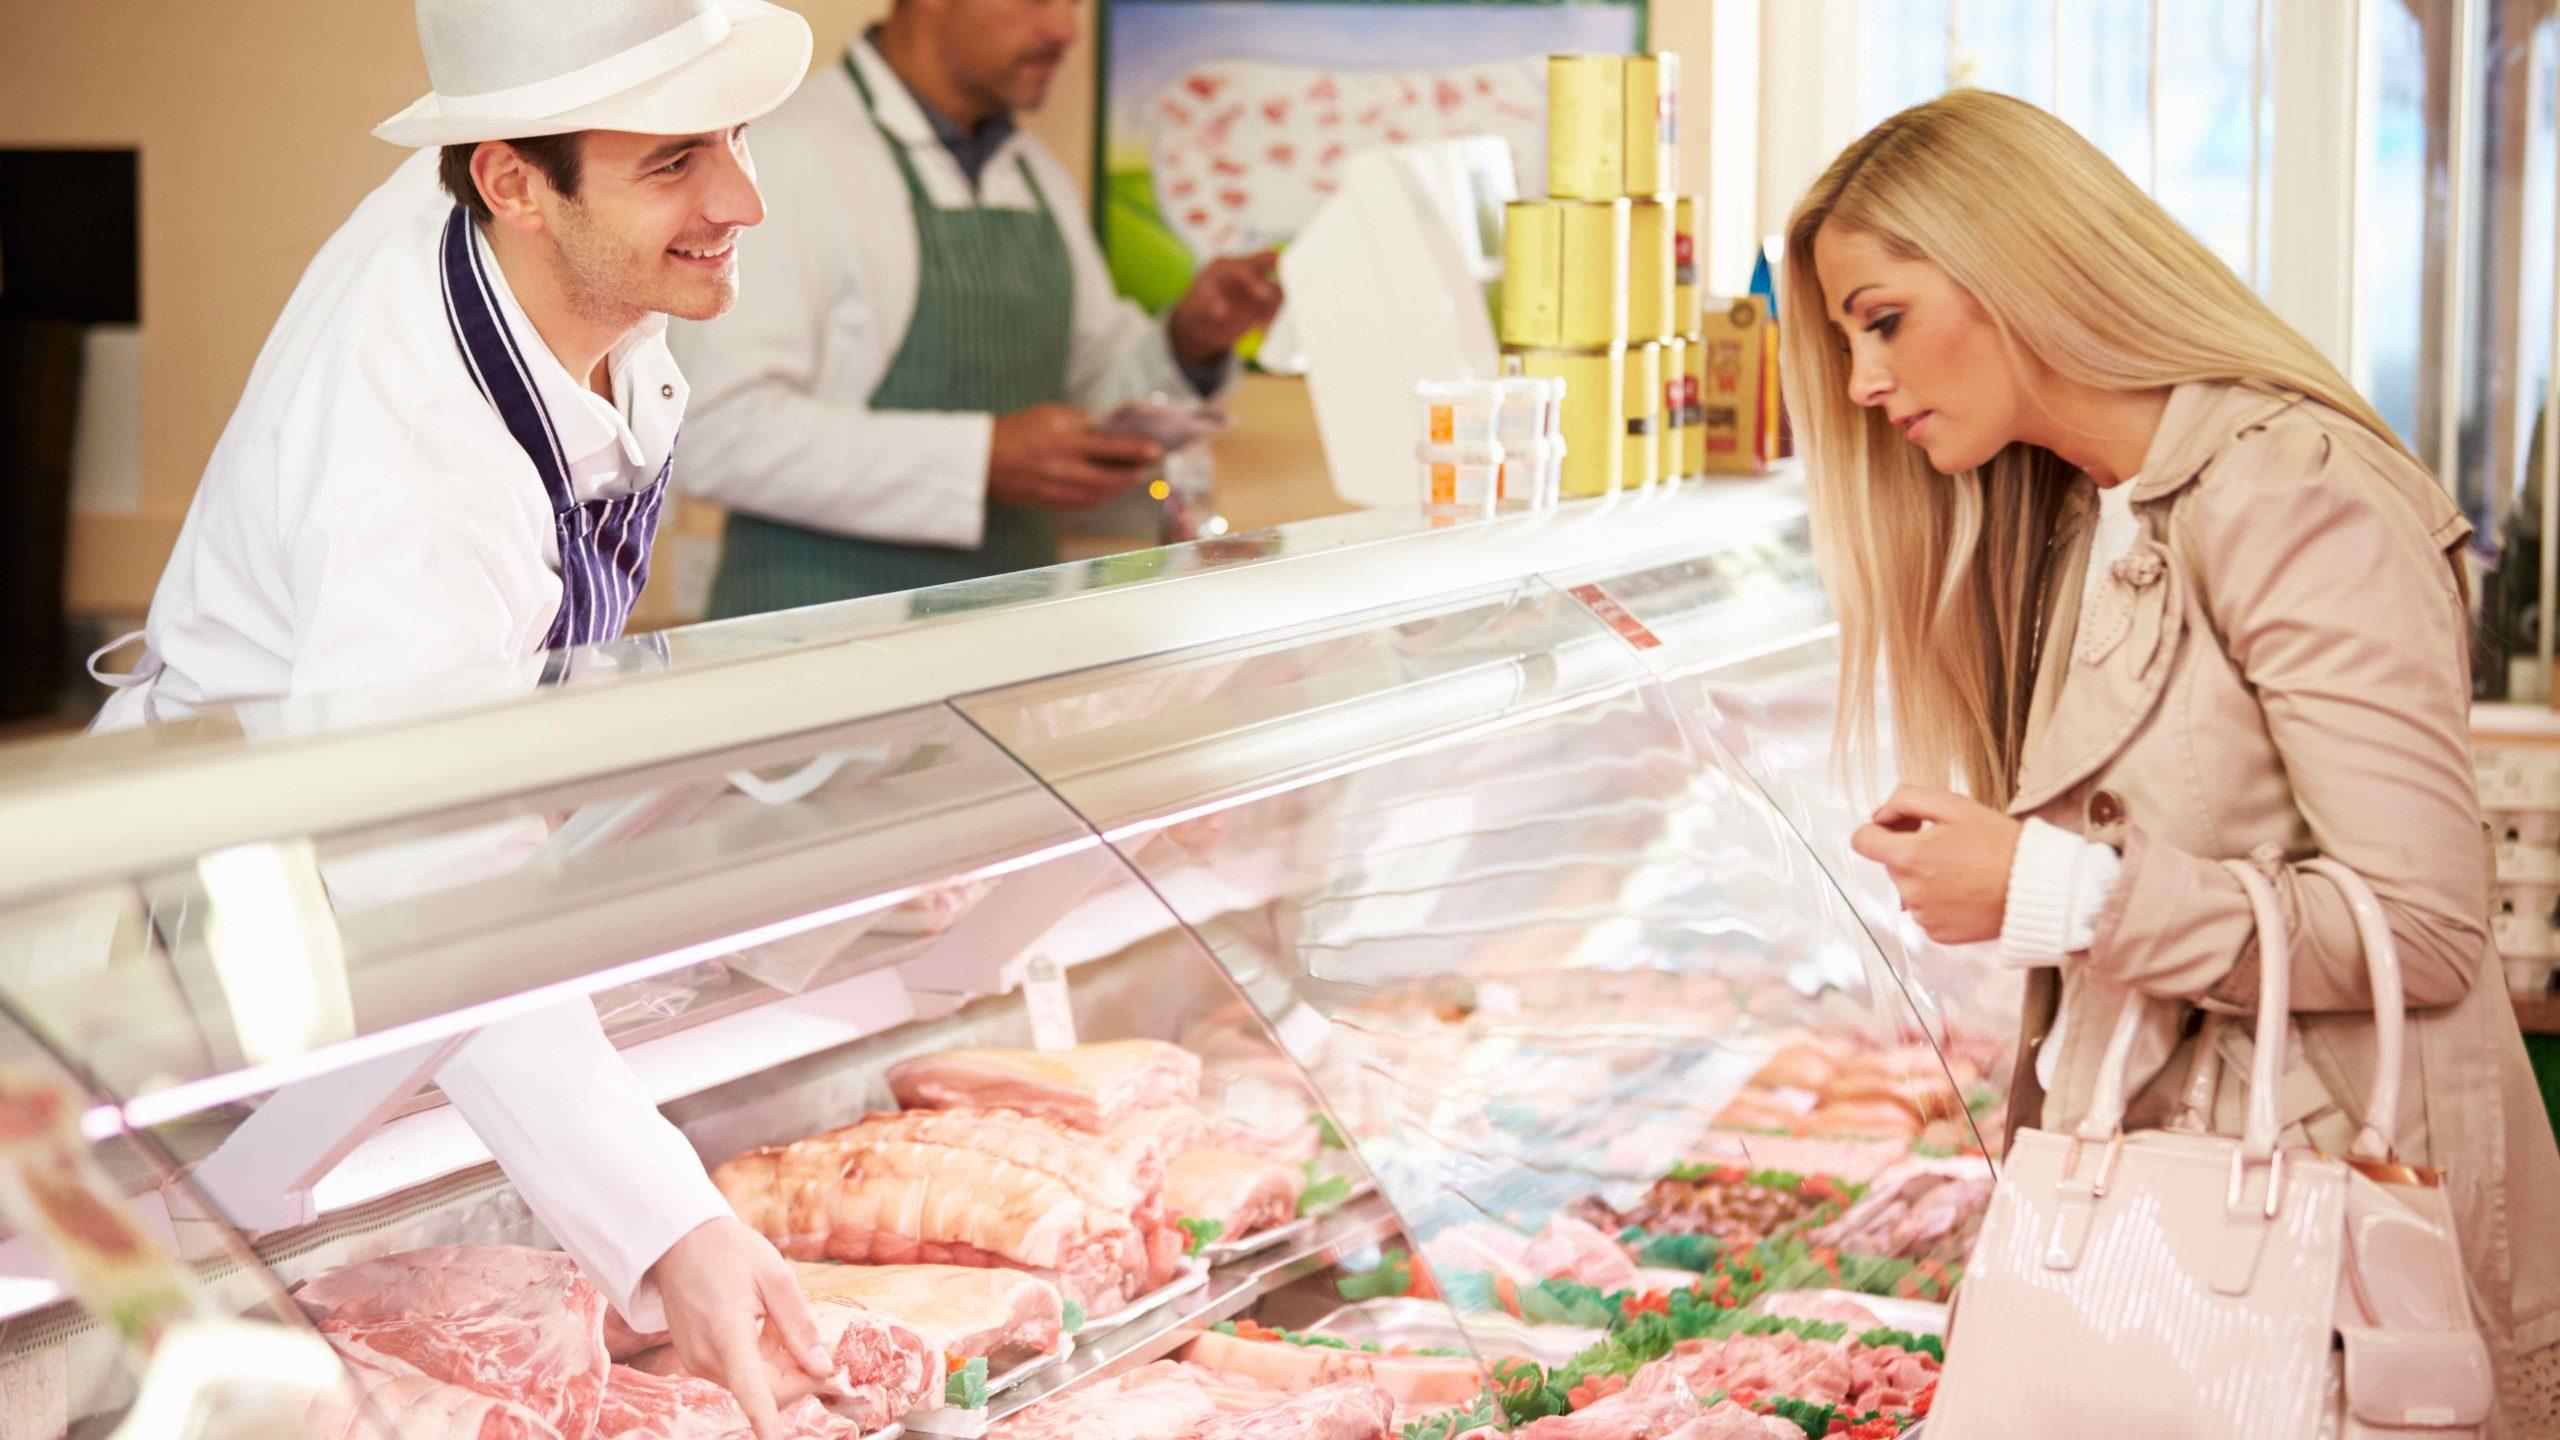 Carnicerias en Aranjuez